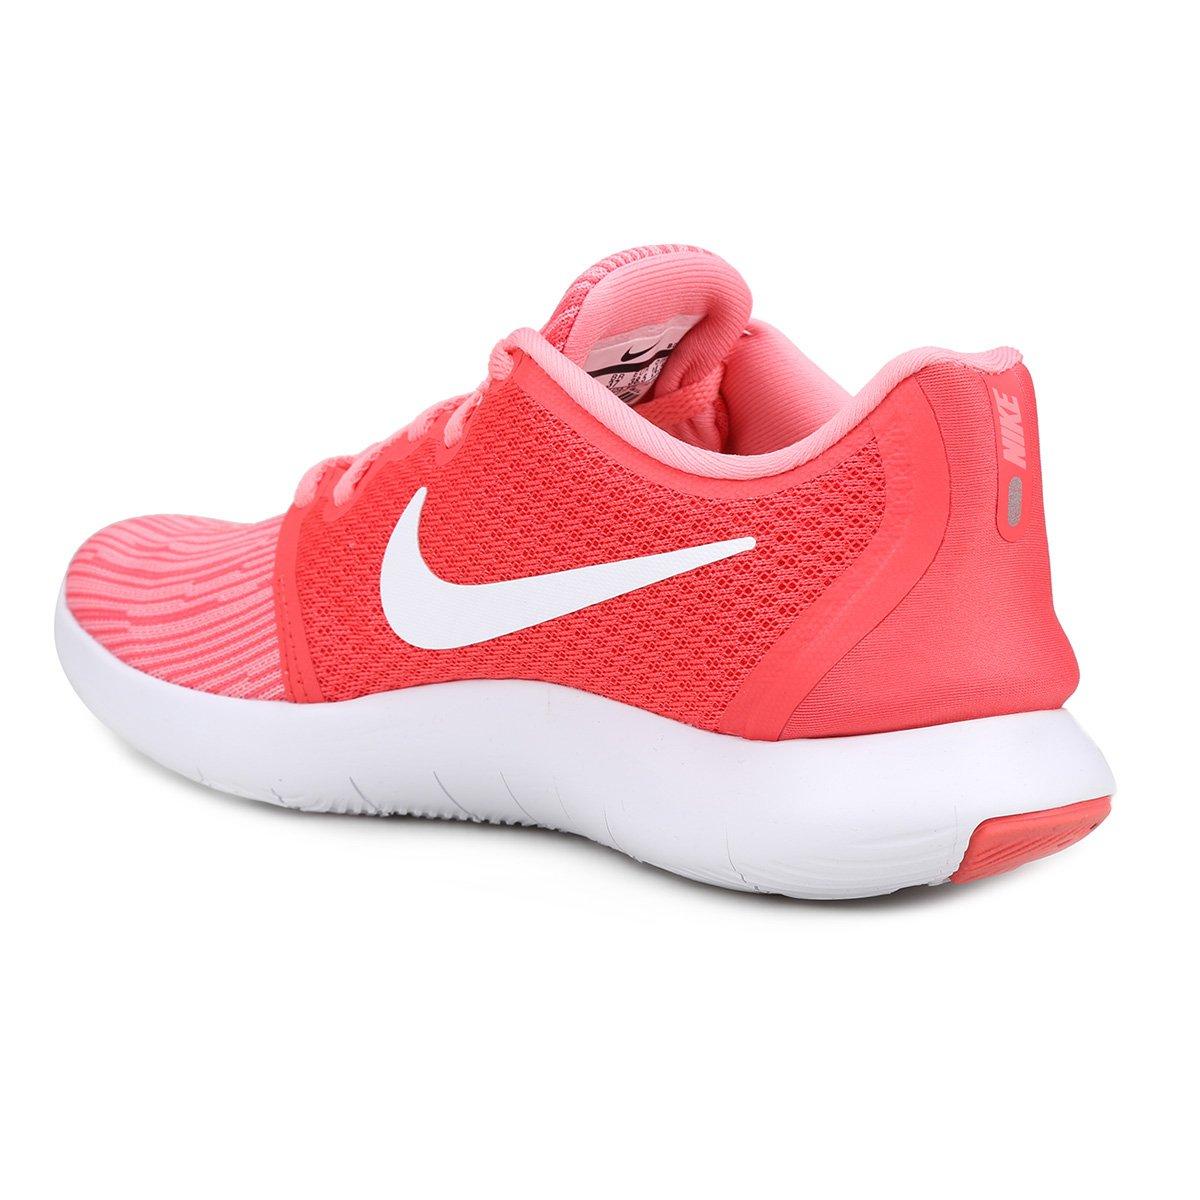 Tênis Nike Flex Contact 2 Feminino - 1